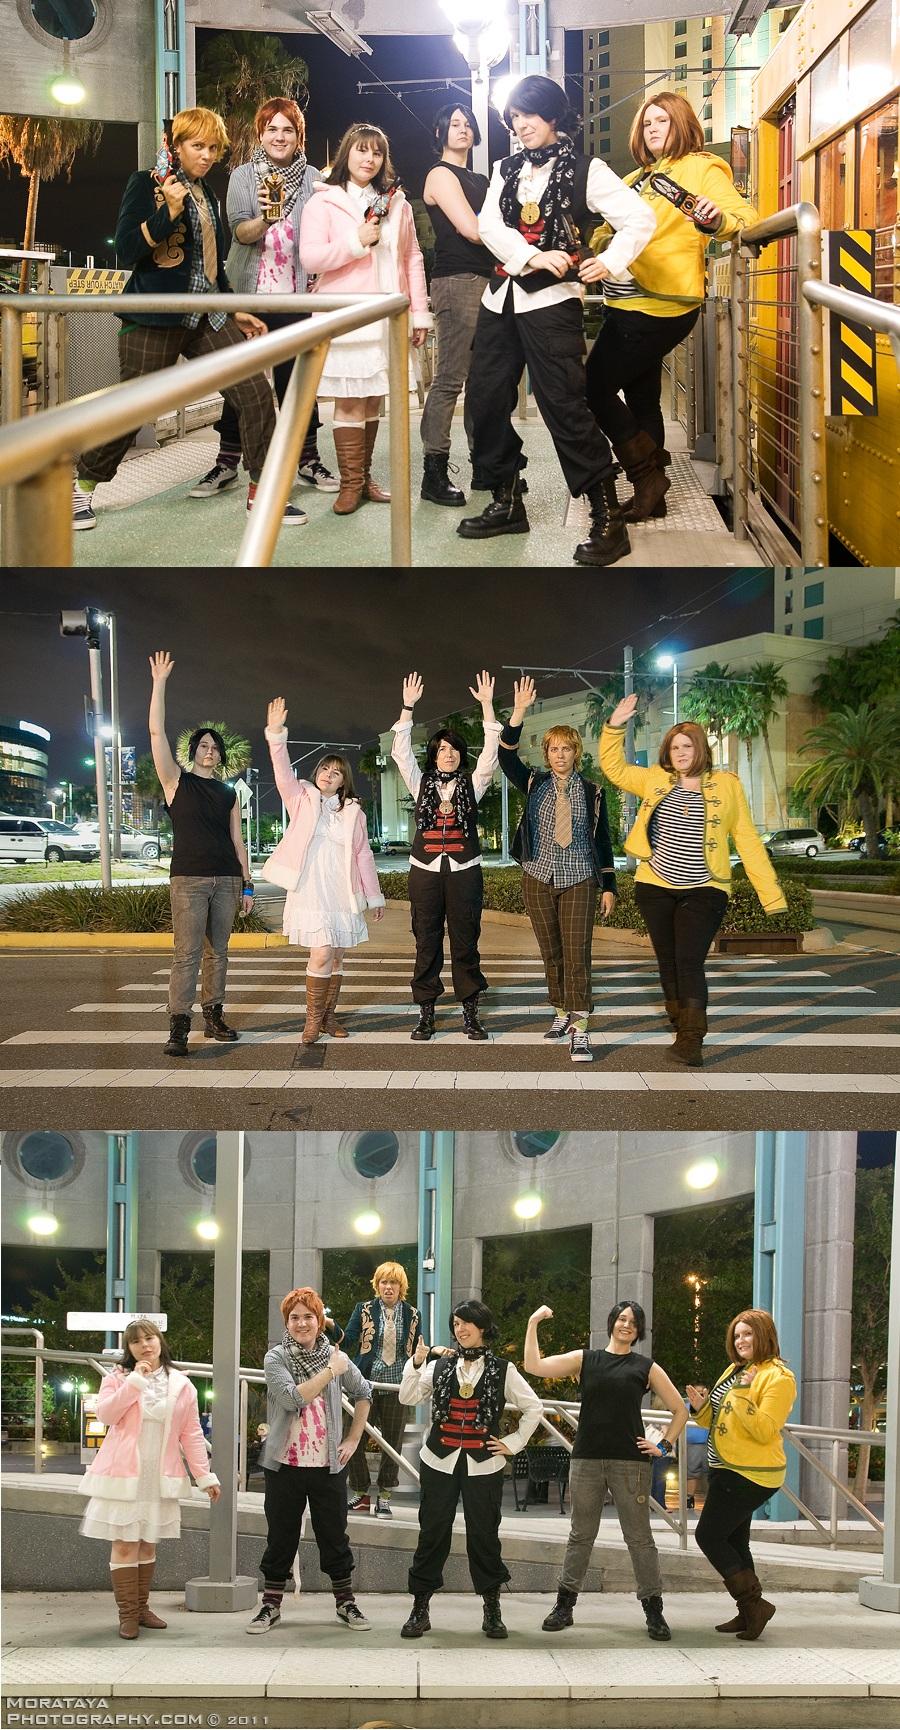 Kaizoku Sentai Gokaiger by Korinchan on DeviantArt